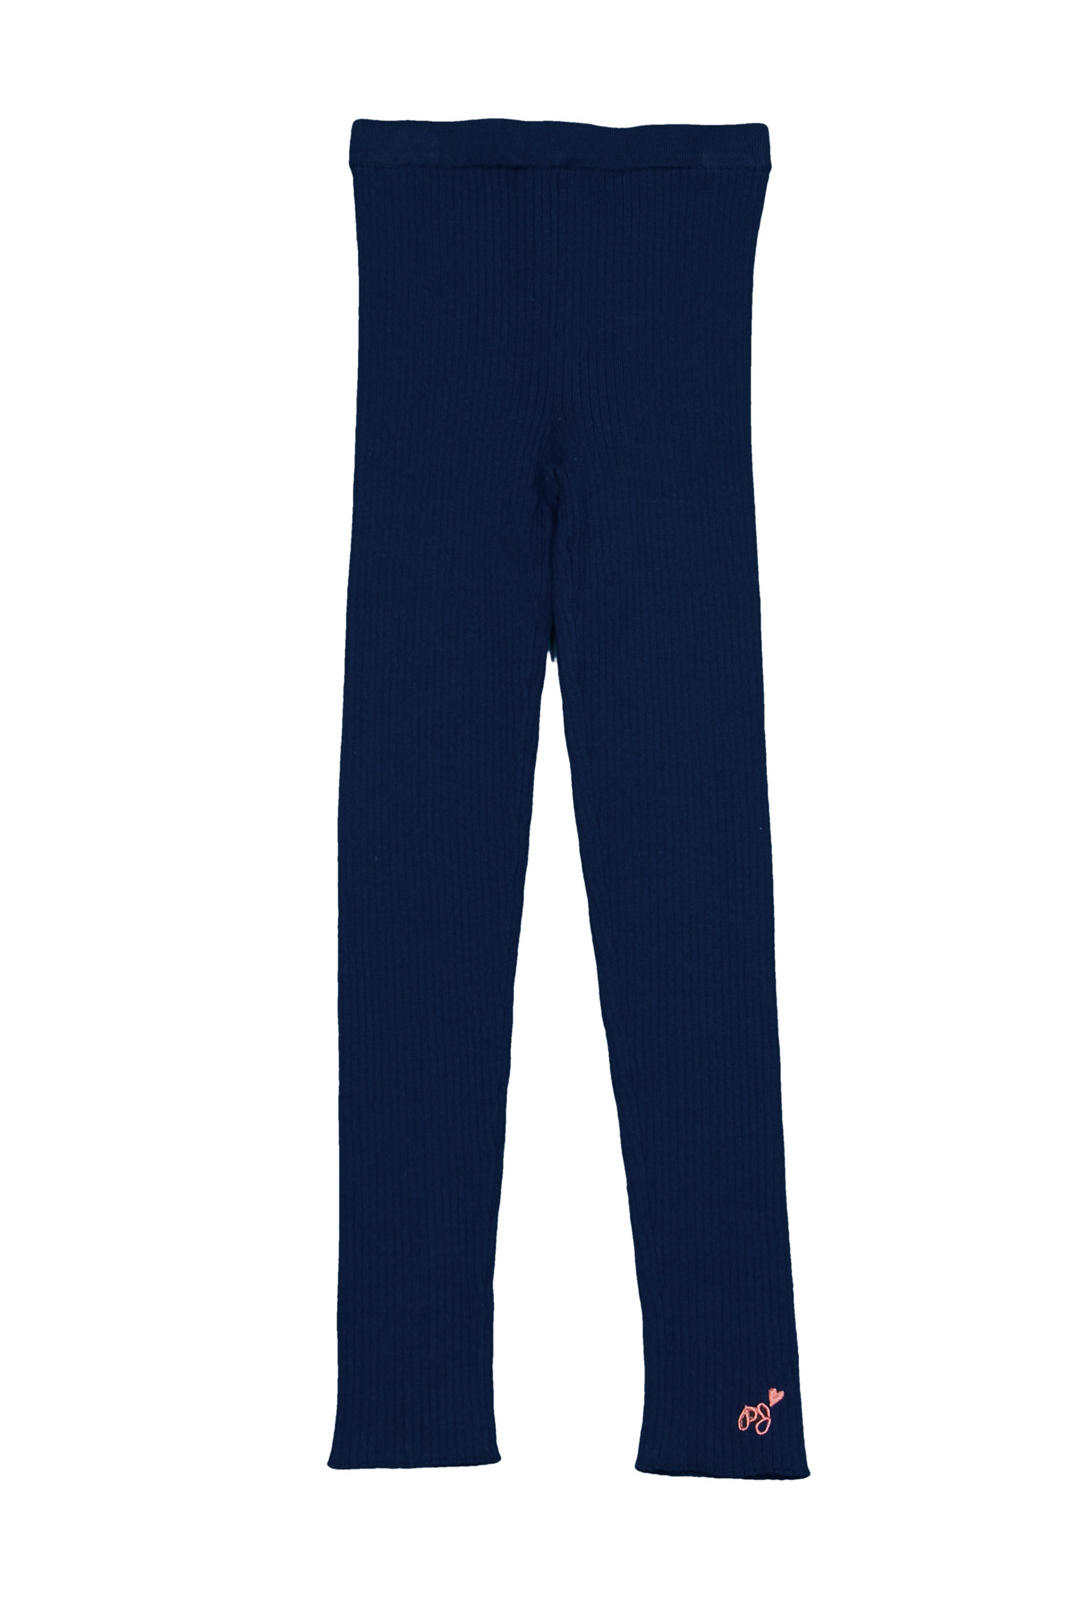 Bas  Pepe jeans PG210351 gayve 595